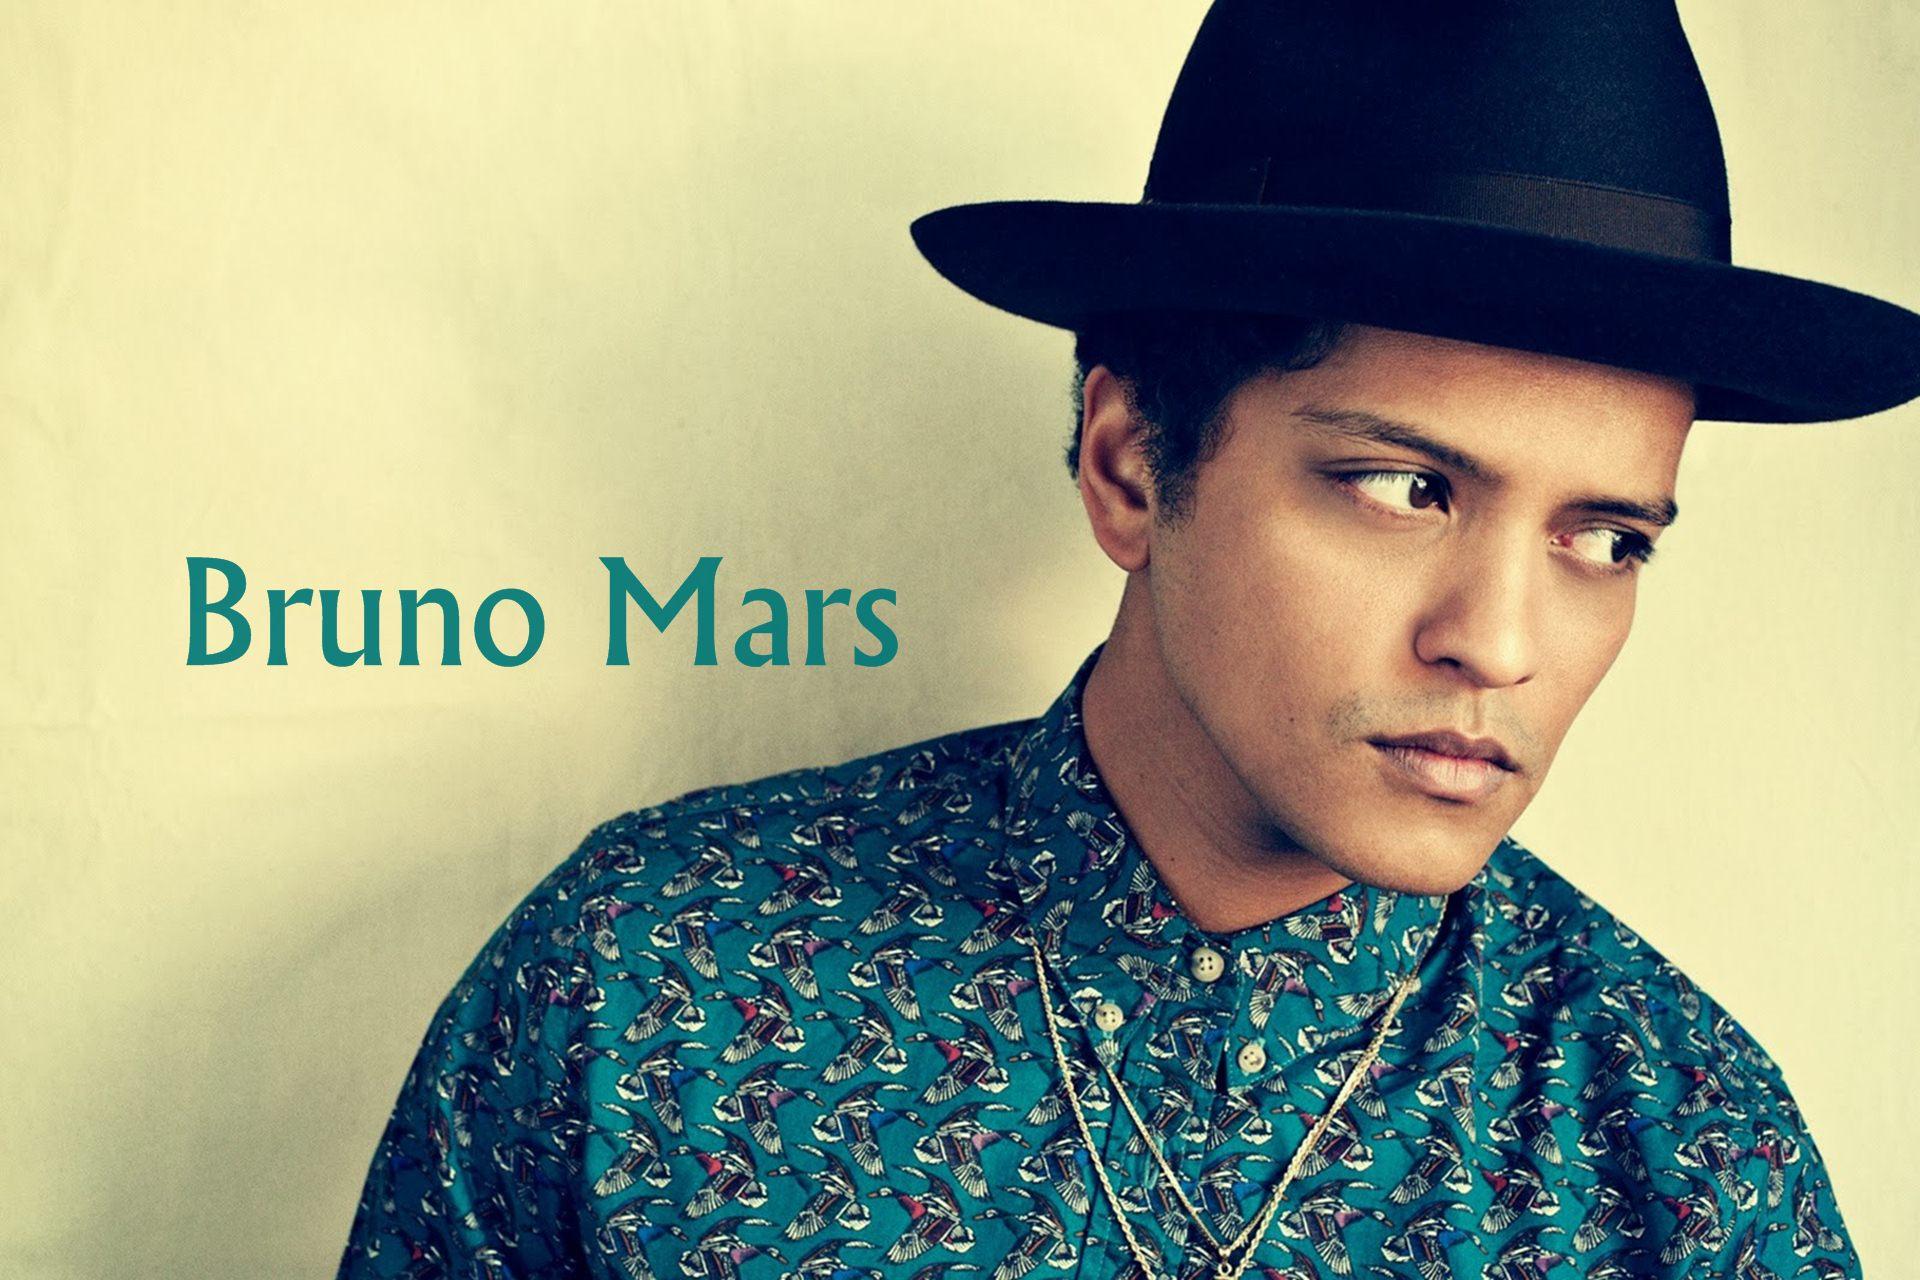 Fall Out Boy Wallpaper 2015 Bruno Mars Wallpapers Hd Pixelstalk Net